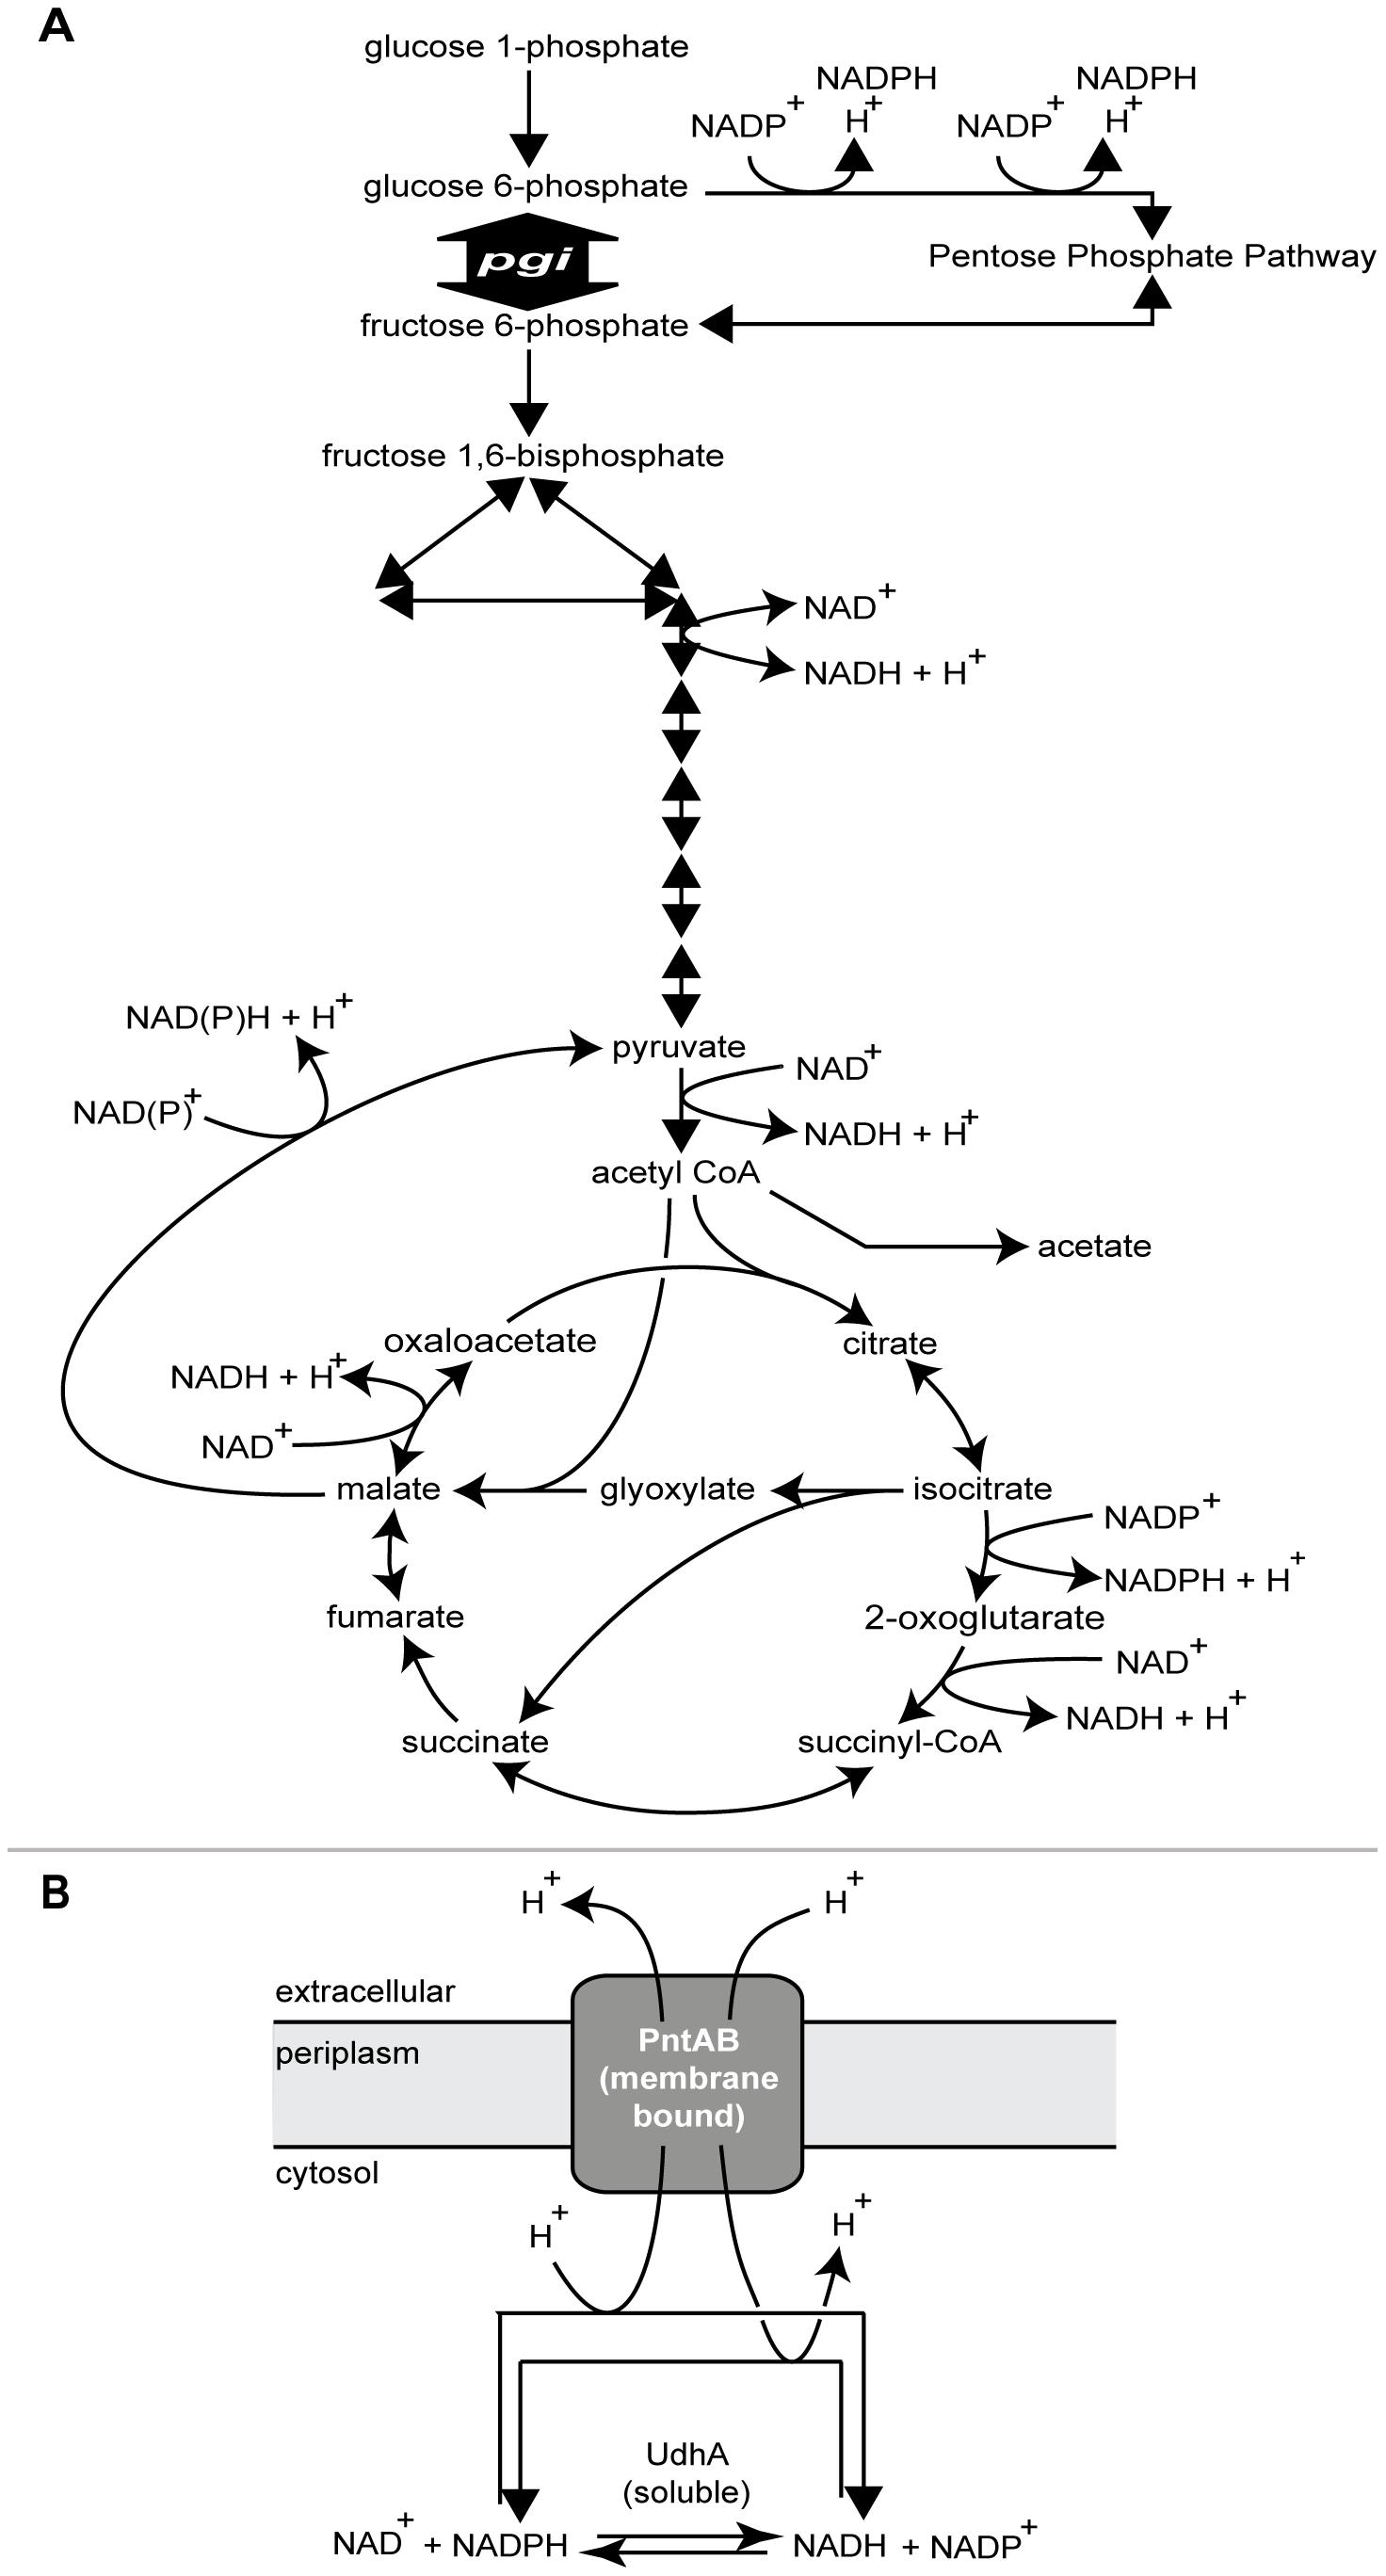 Role of <i>pgi</i>, <i>udhA</i>, and <i>pntAB</i> in cellular metabolism.